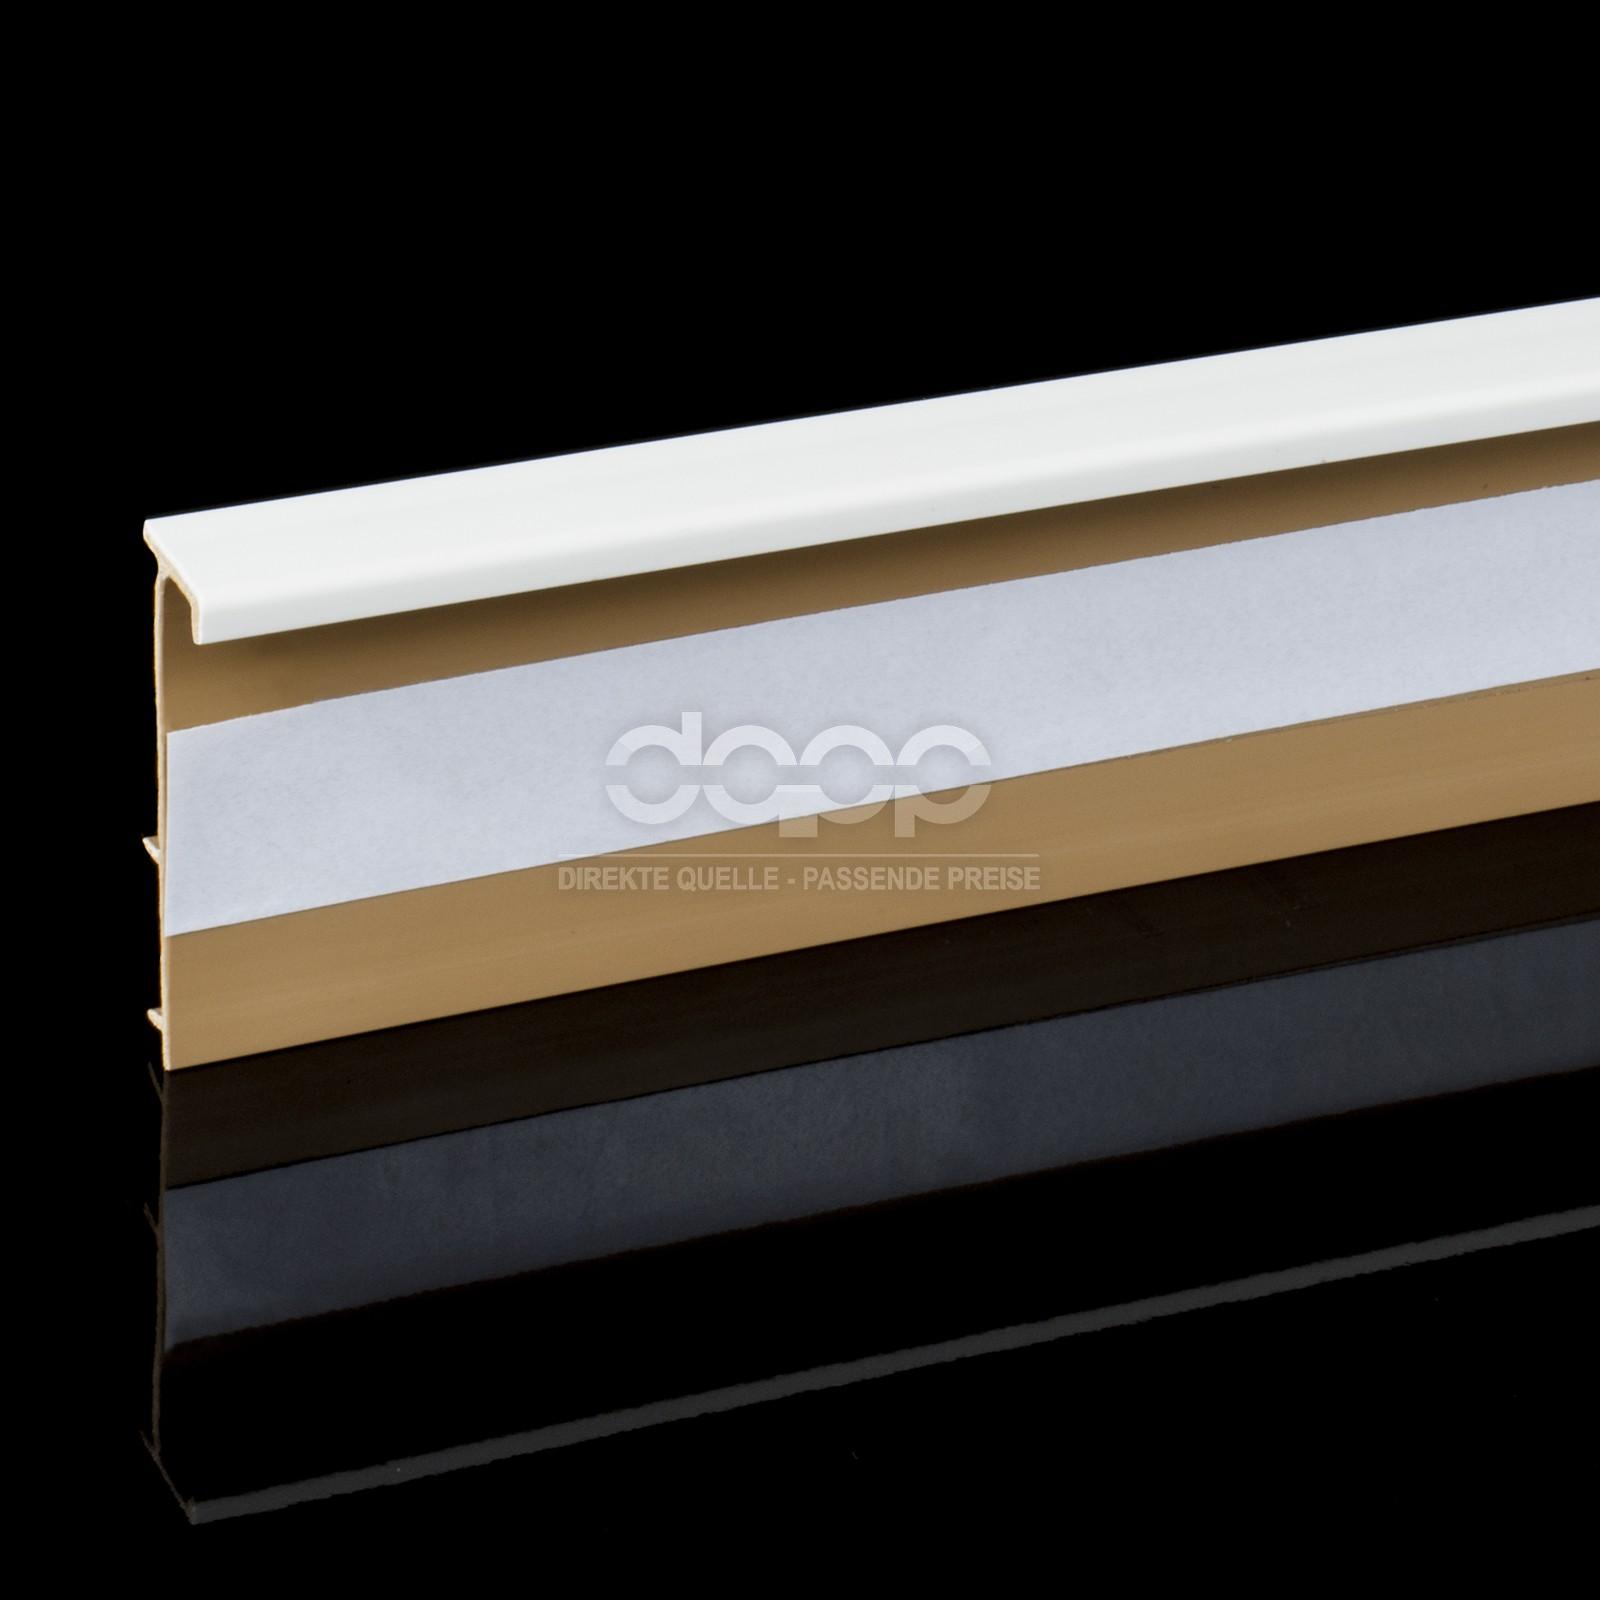 Plinthe pour tapis pvc blanc 2 5m accessoires angle bord - Plinthe pvc blanc ...